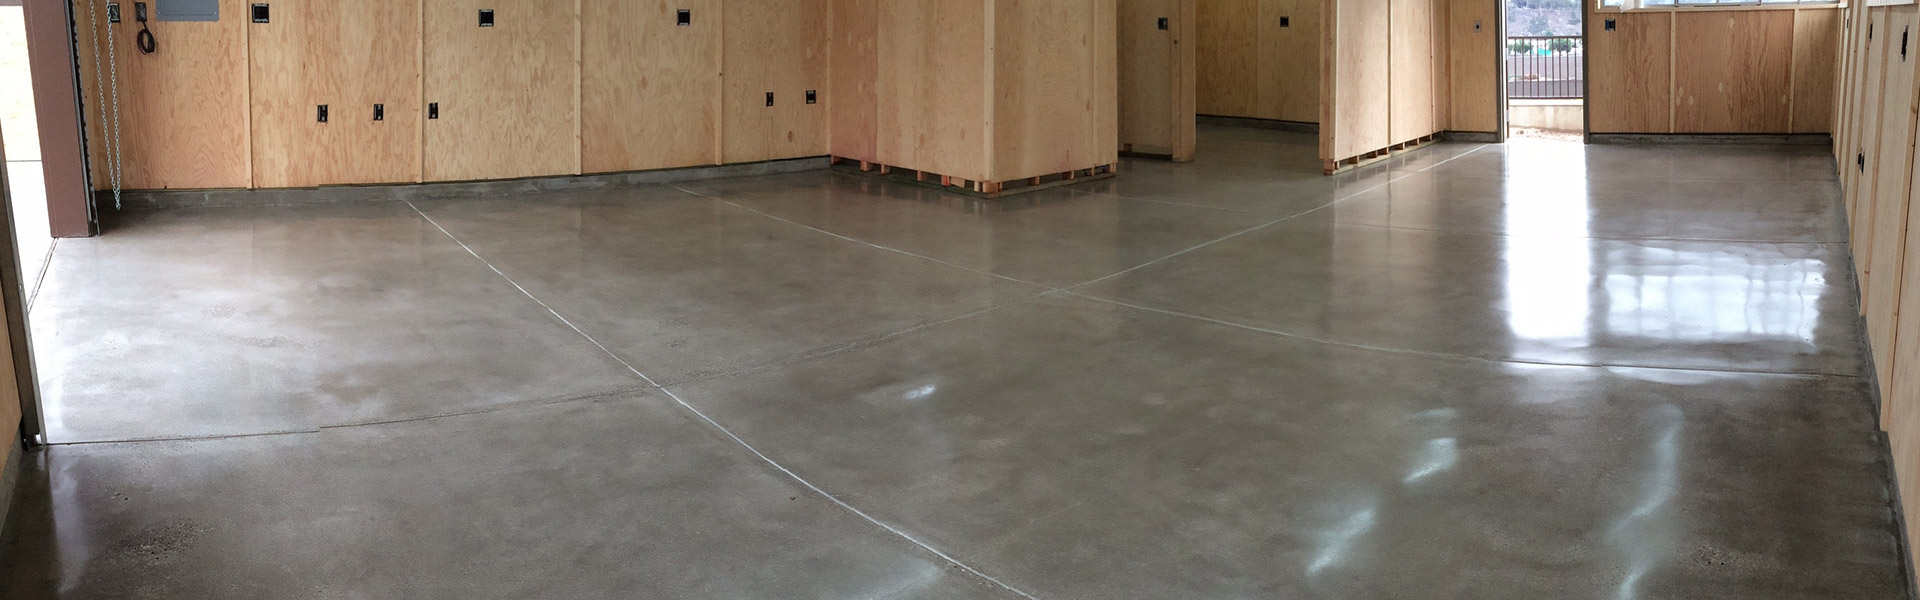 Polish Concrete Floors